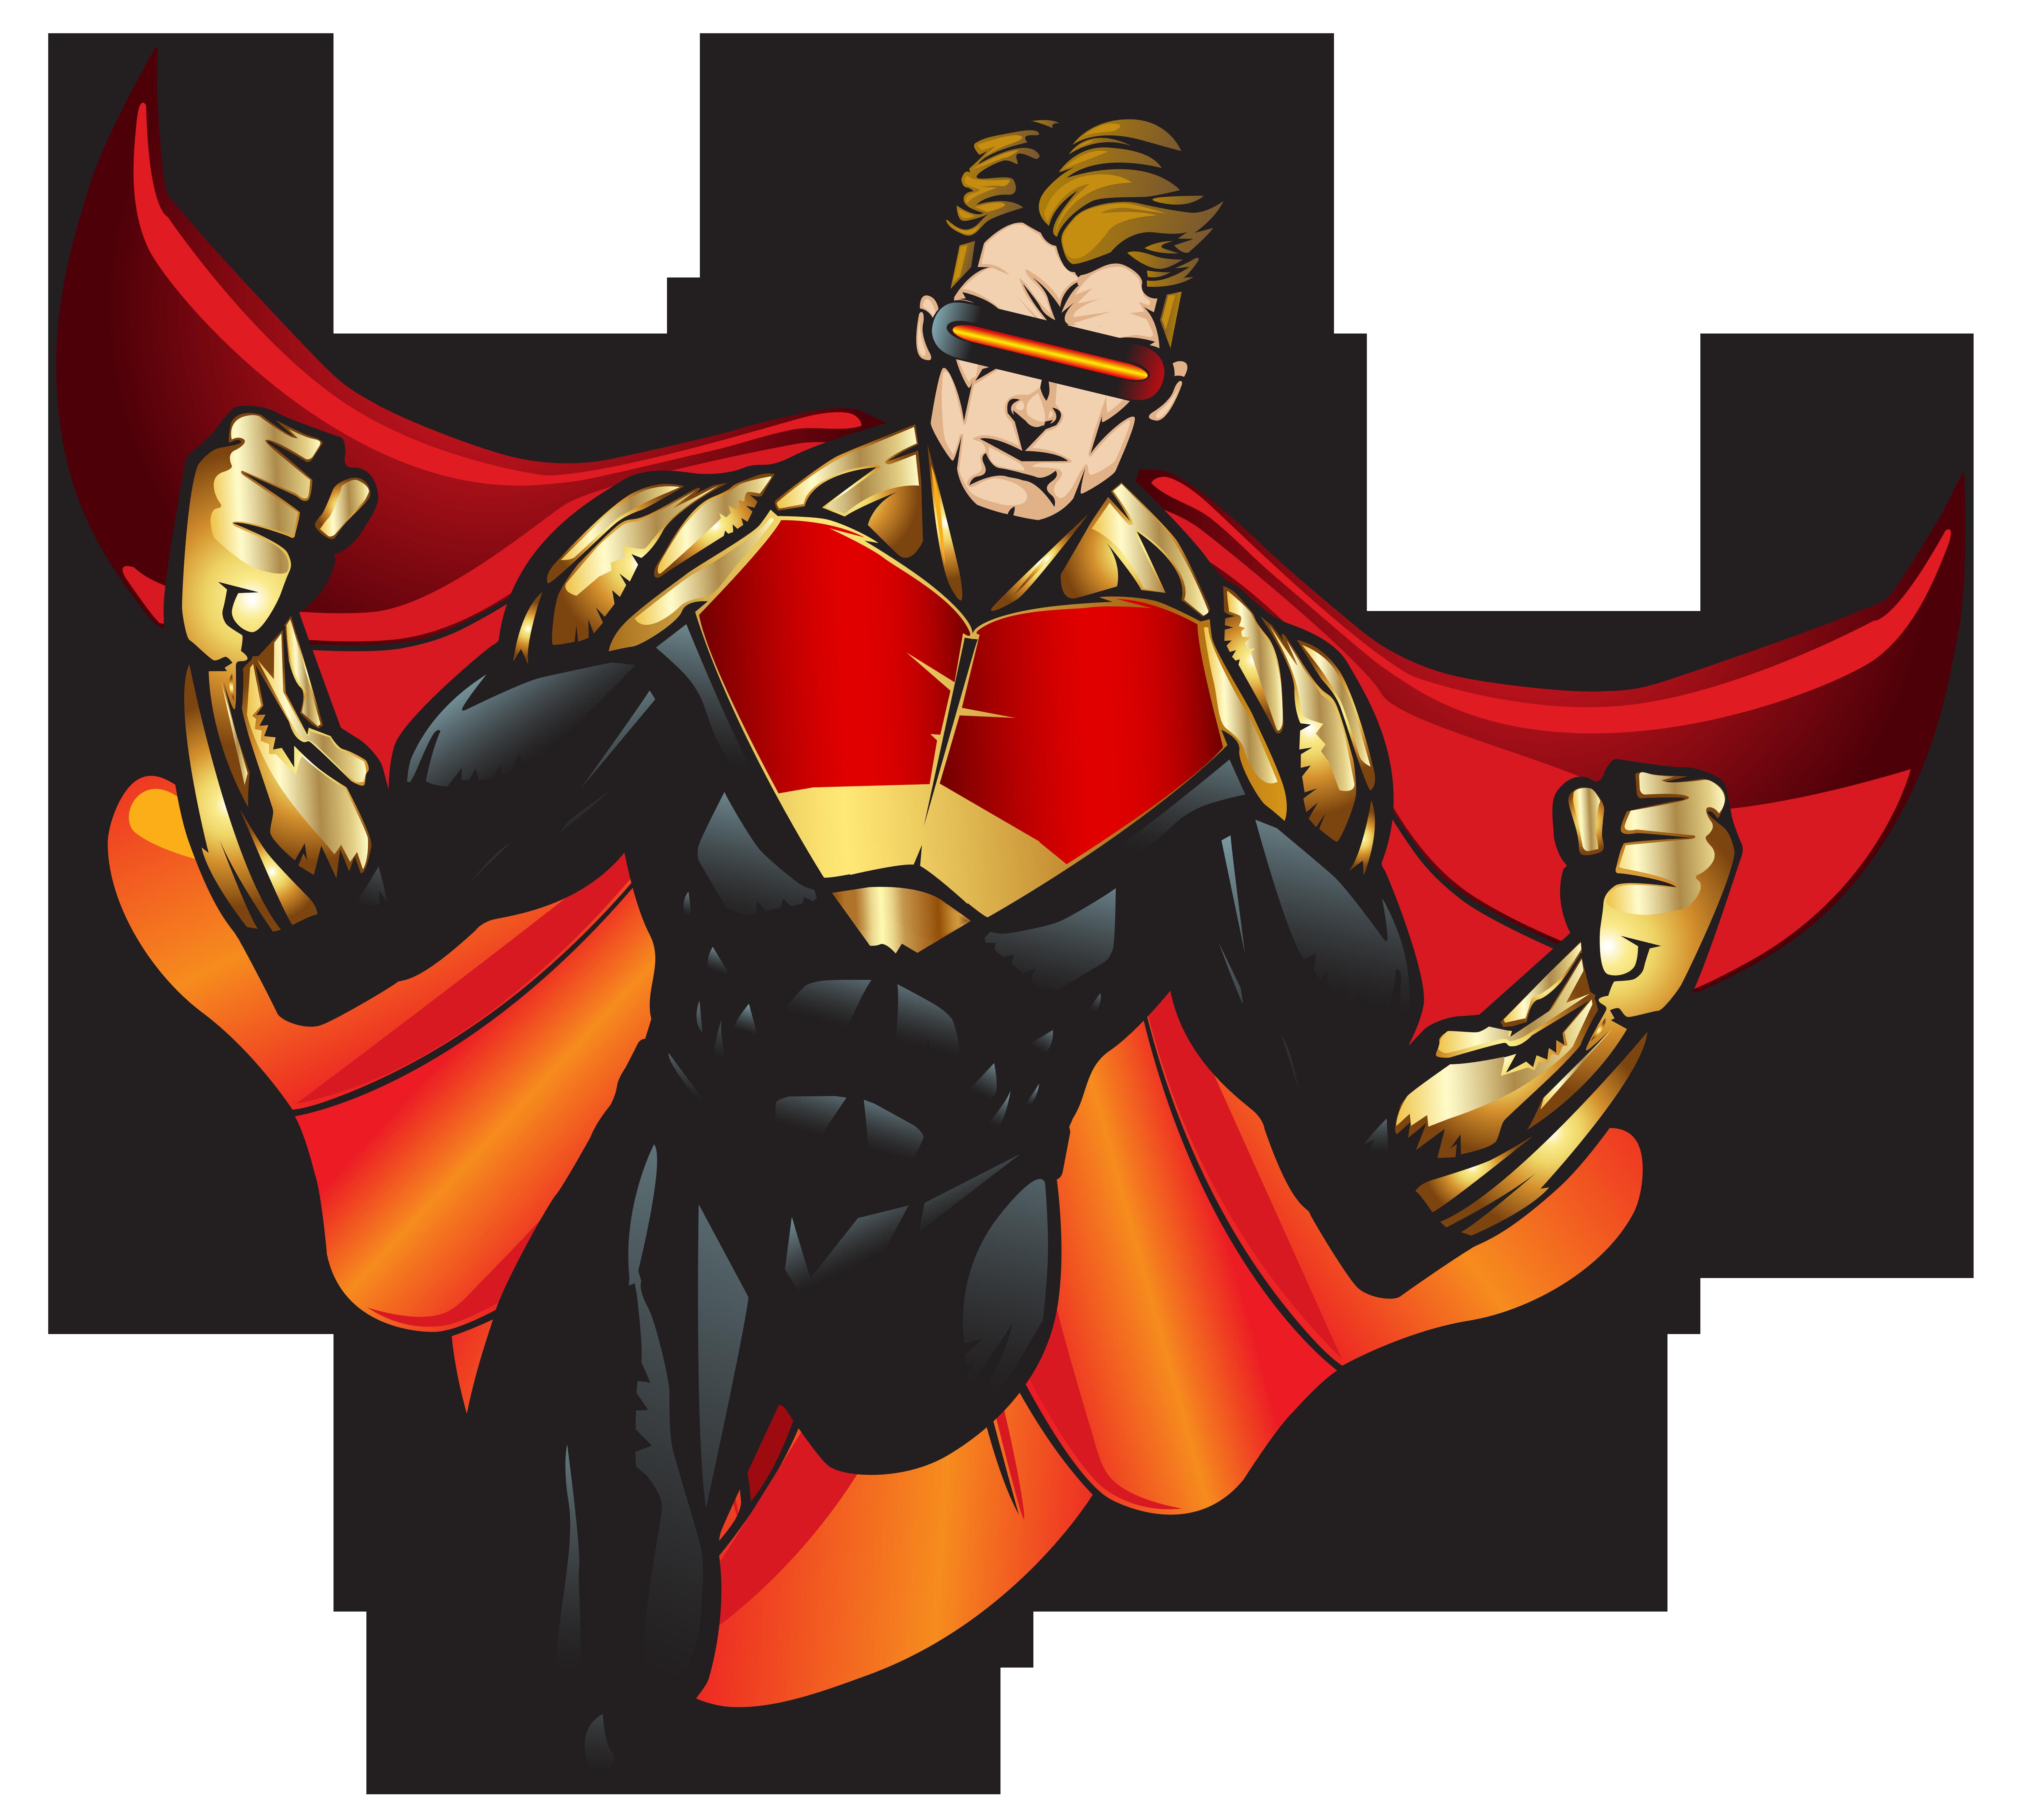 Png best web. Clock clipart superhero